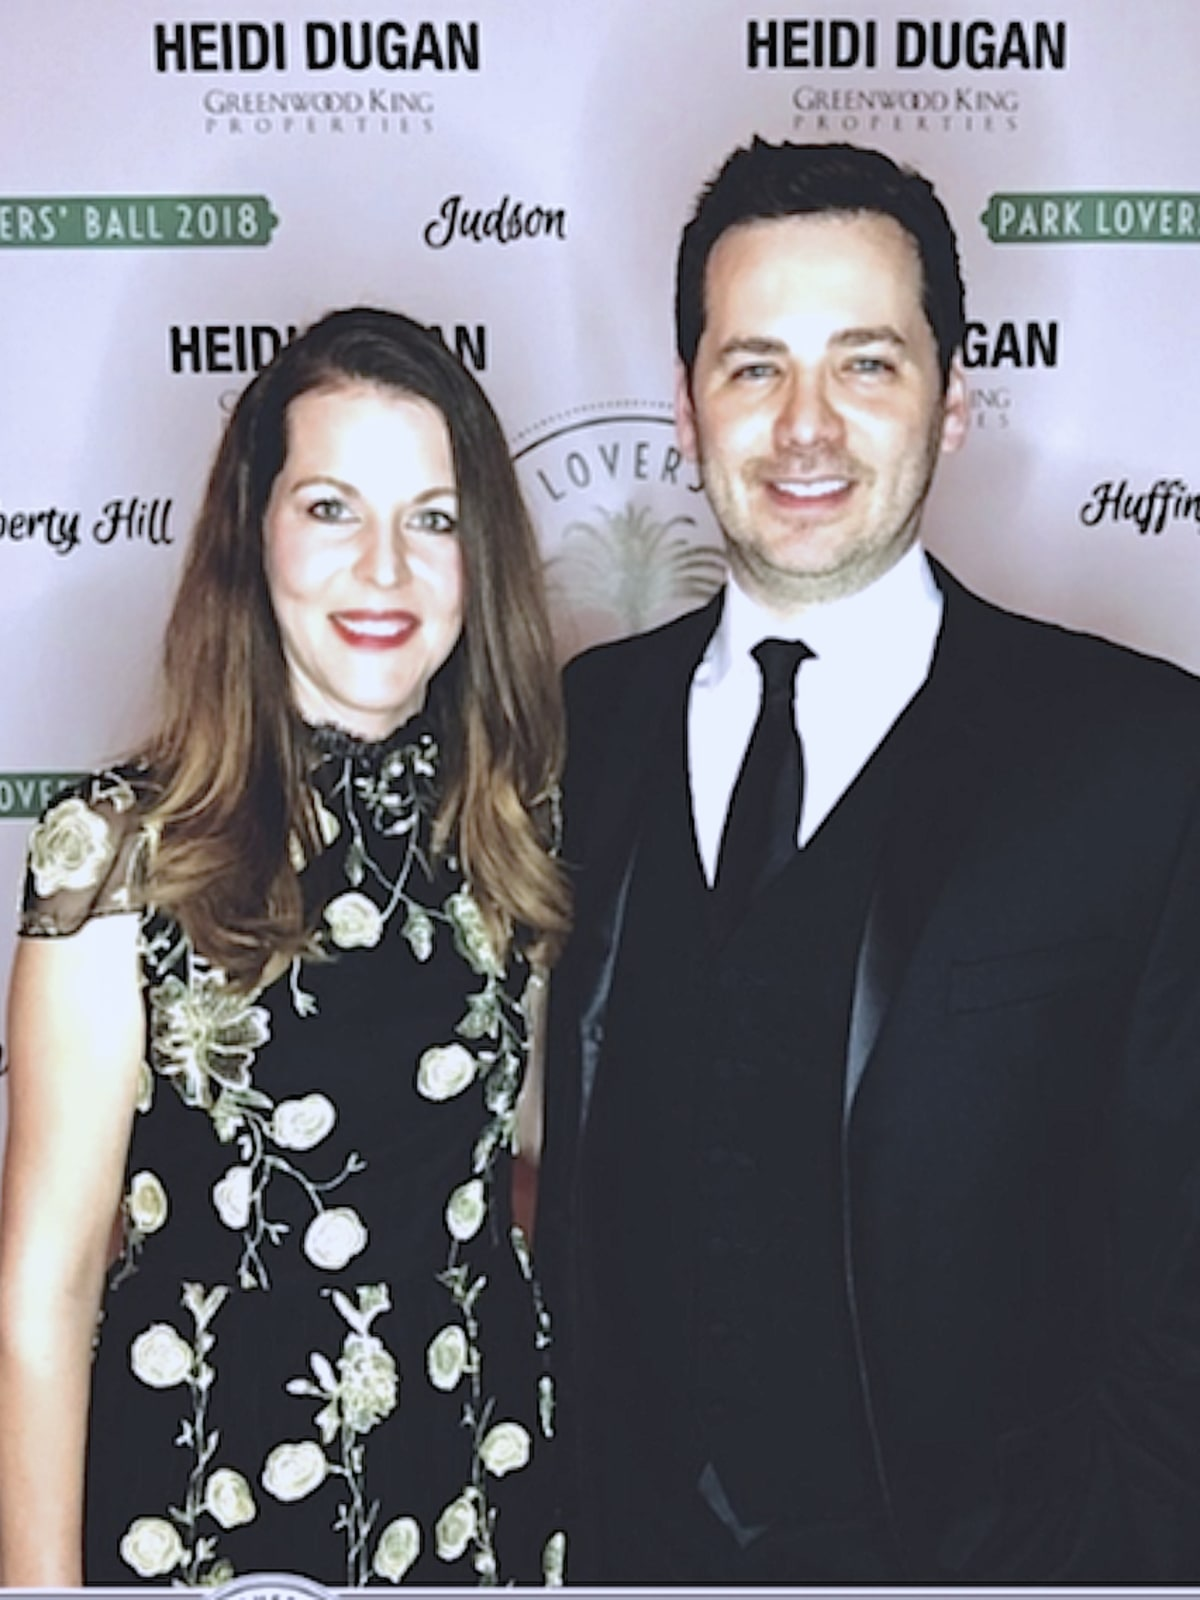 Houston, West University Park Lovers' Ball, February 2018, Caroline and Justin Simons